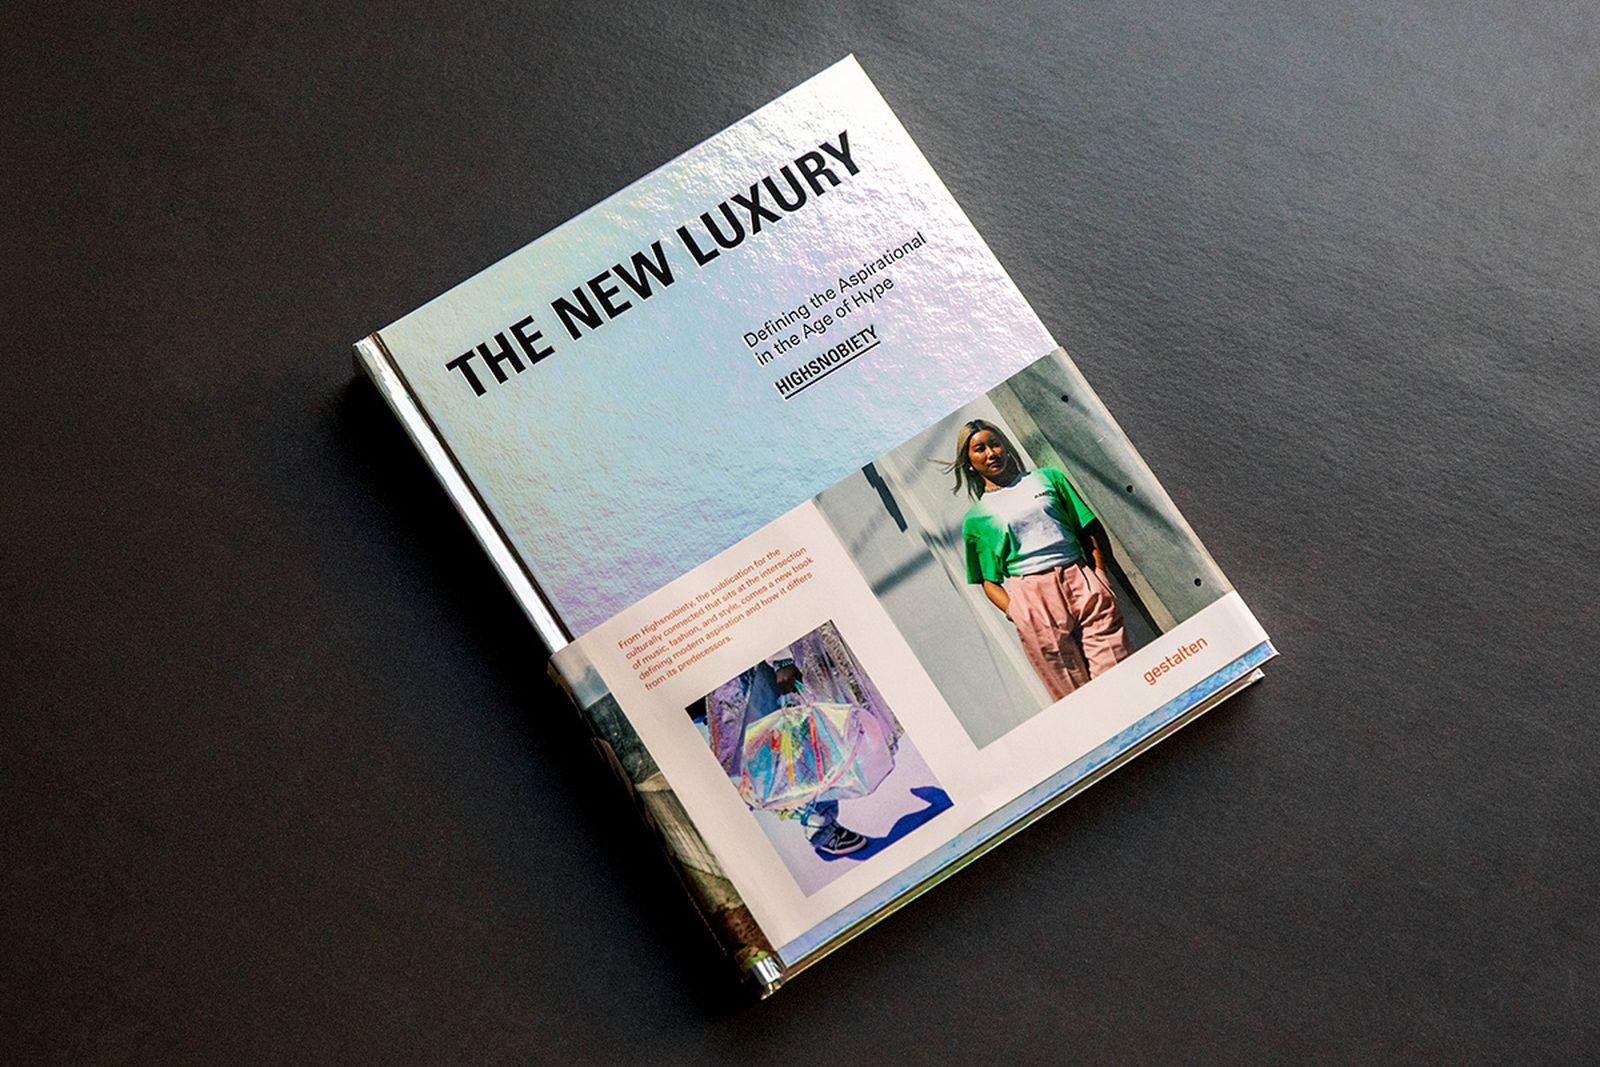 2019 Highsnobiety New Luxury Book Images BryanLuna highsnobiety books the new luxury